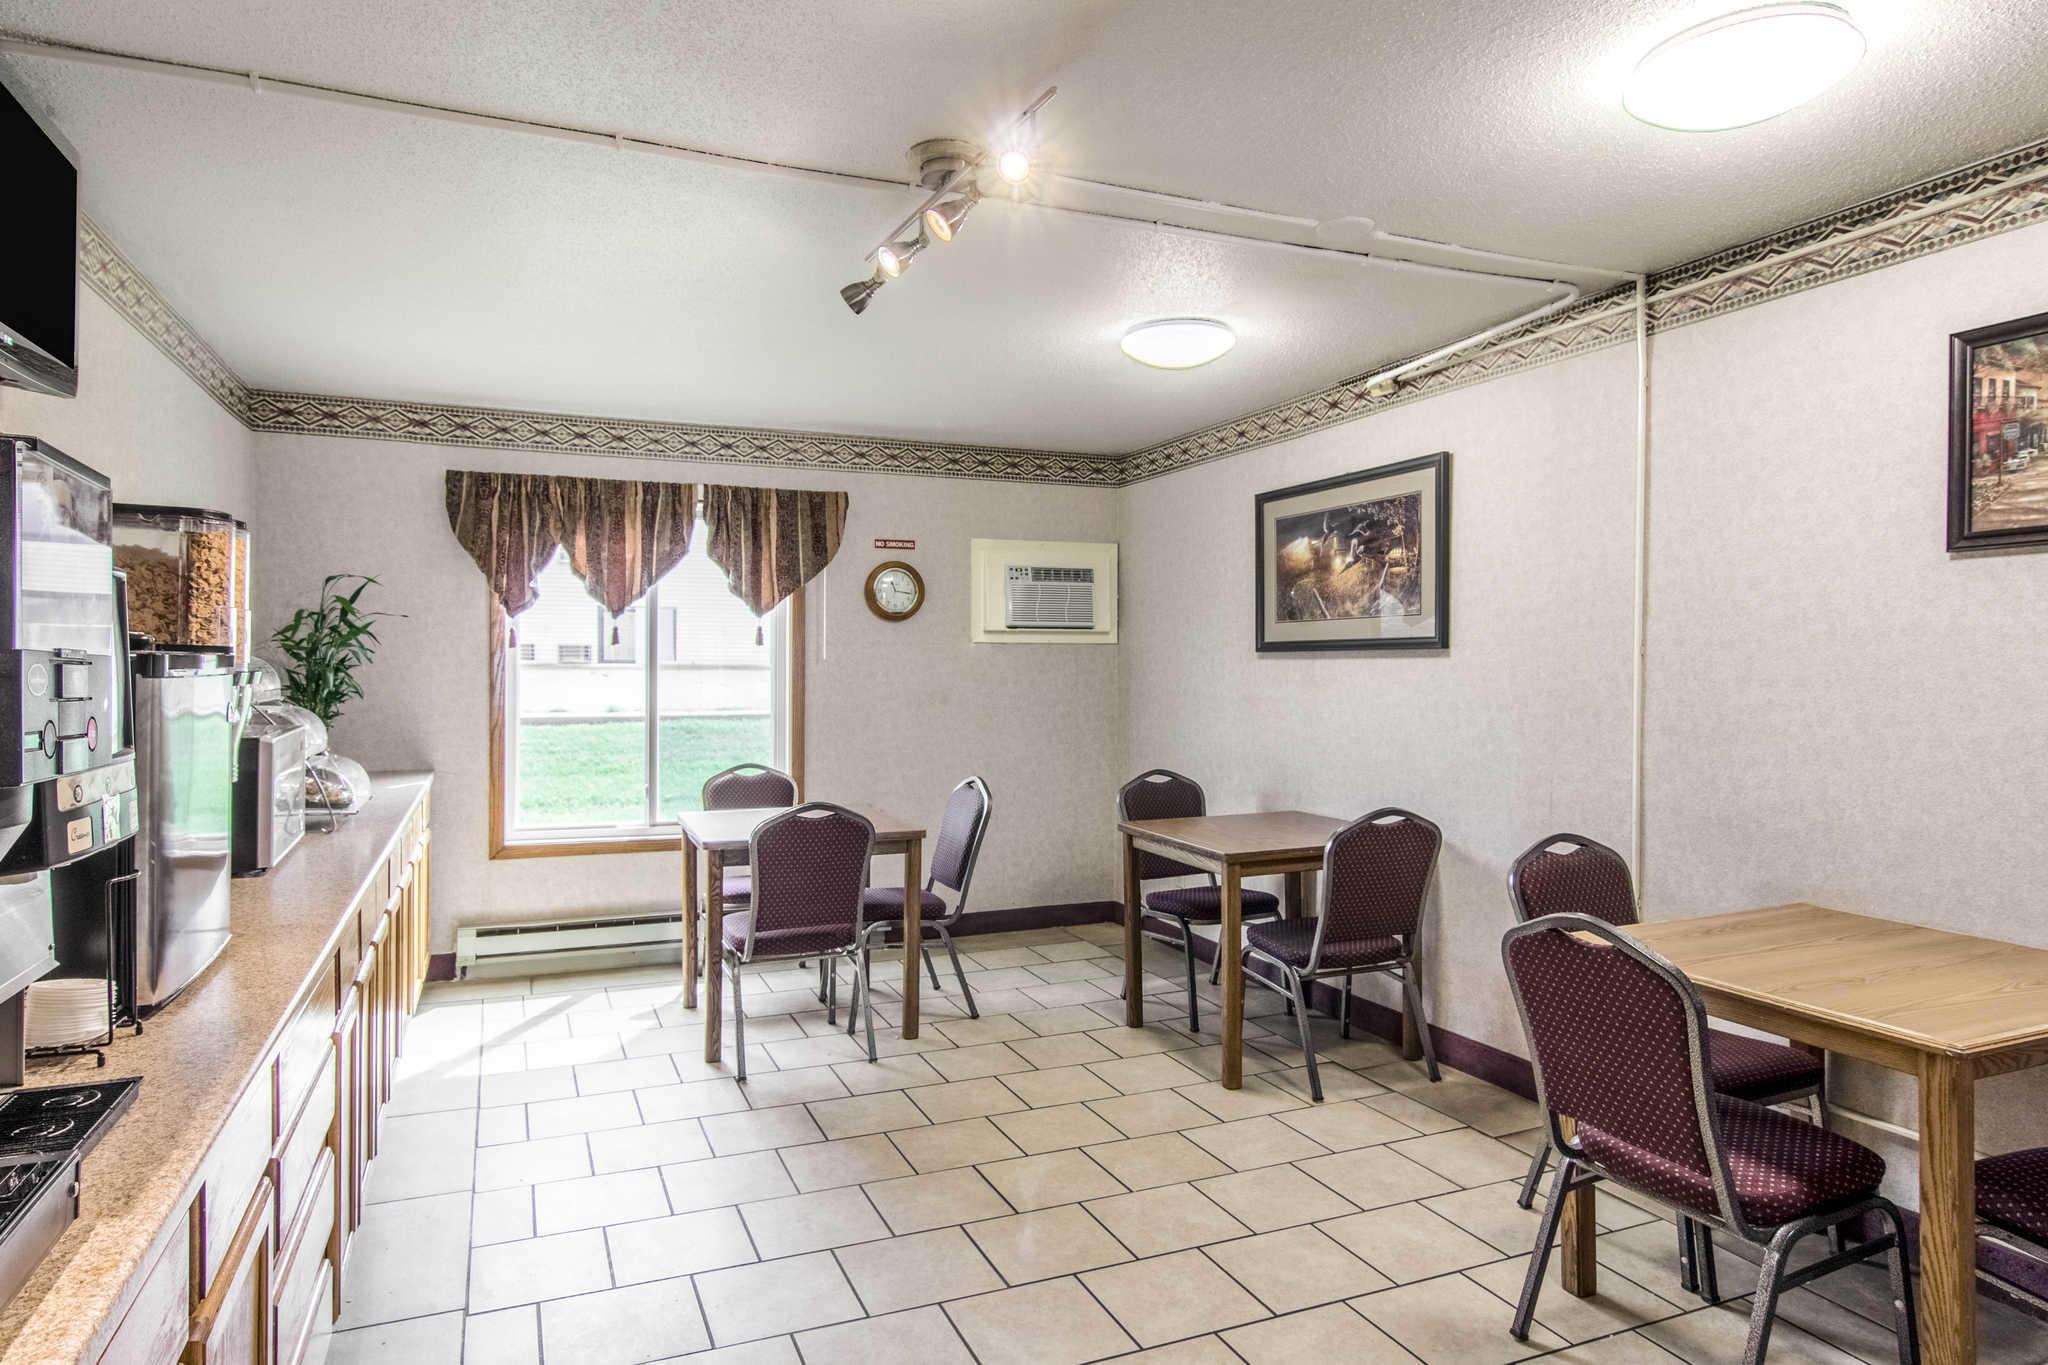 Rodeway Inn image 27